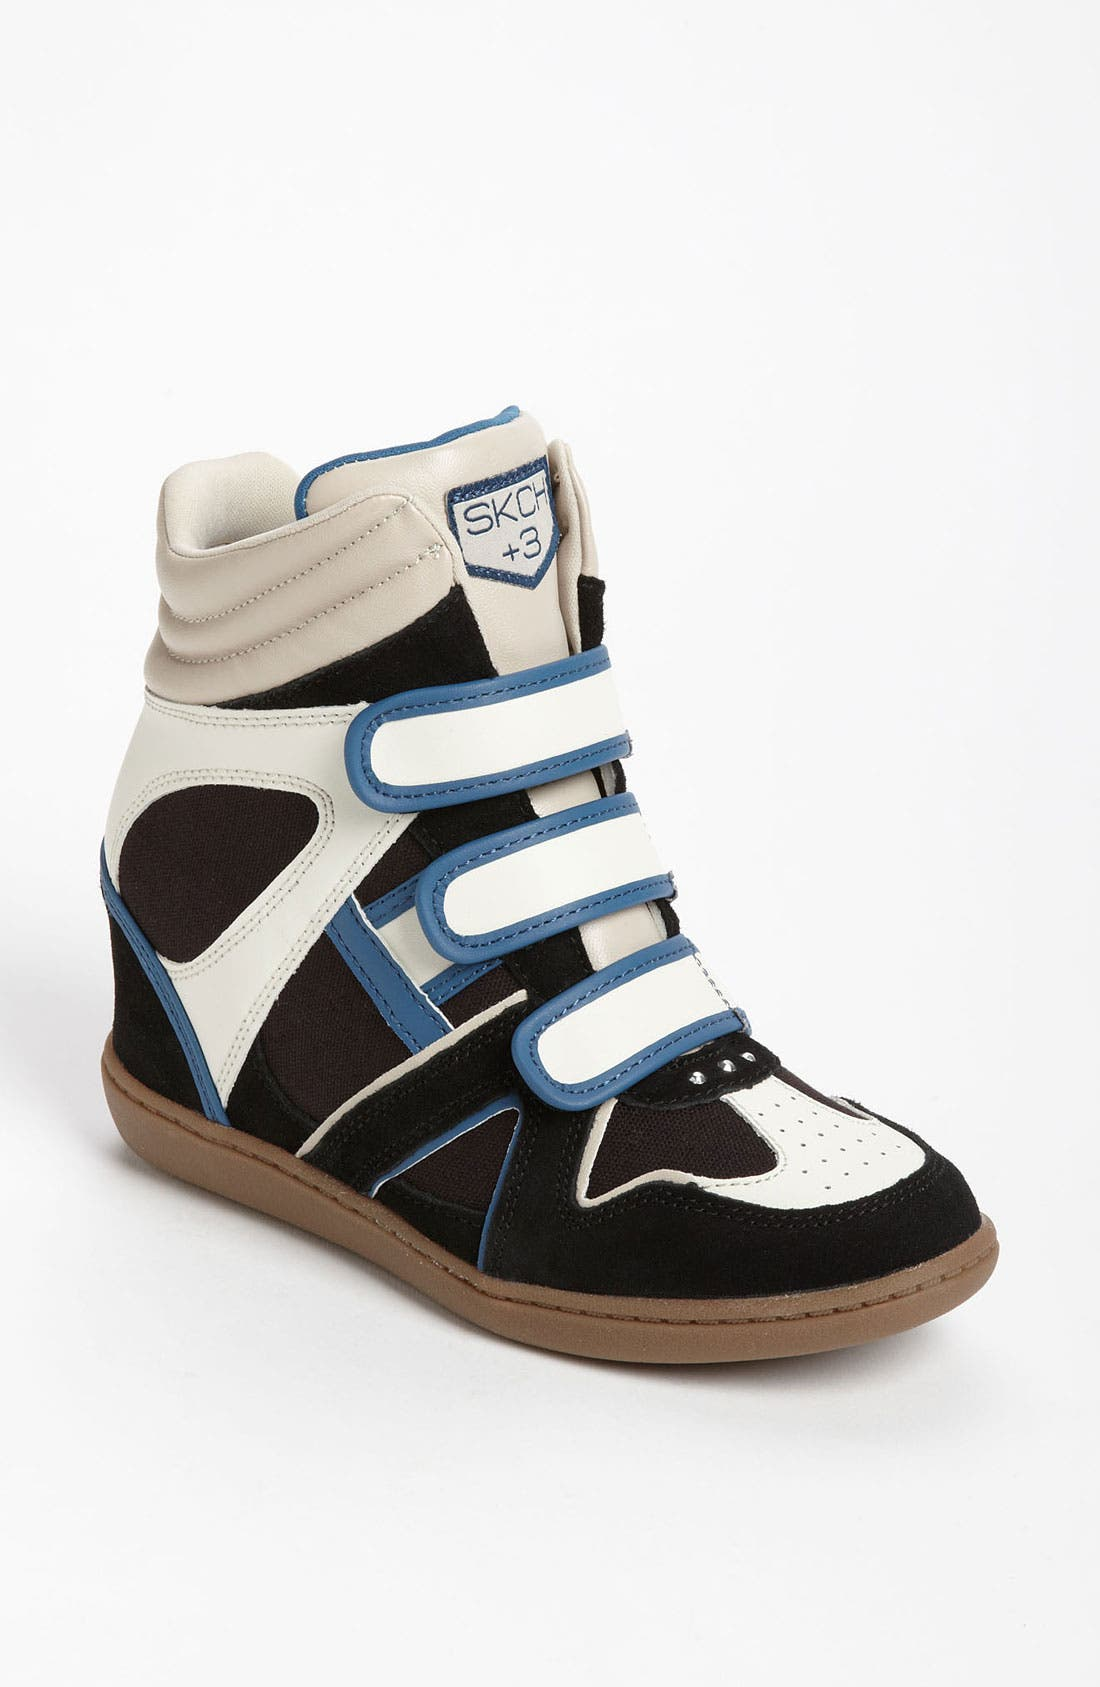 Main Image - SKECHERS 'Plus 3 Binder' Sneaker (Women)